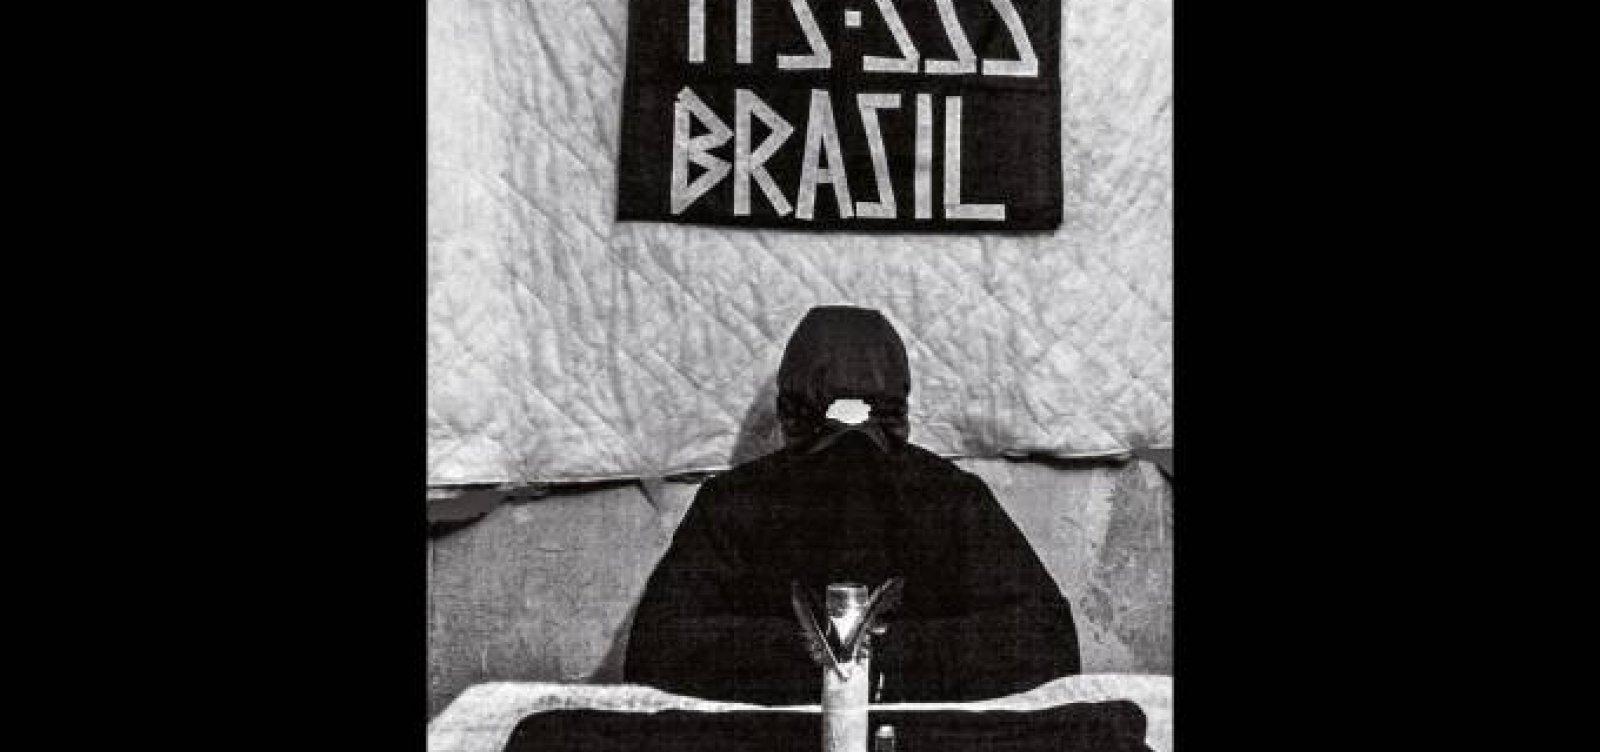 [Grupo terrorista revela plano para matar Bolsonaro, diz revista]